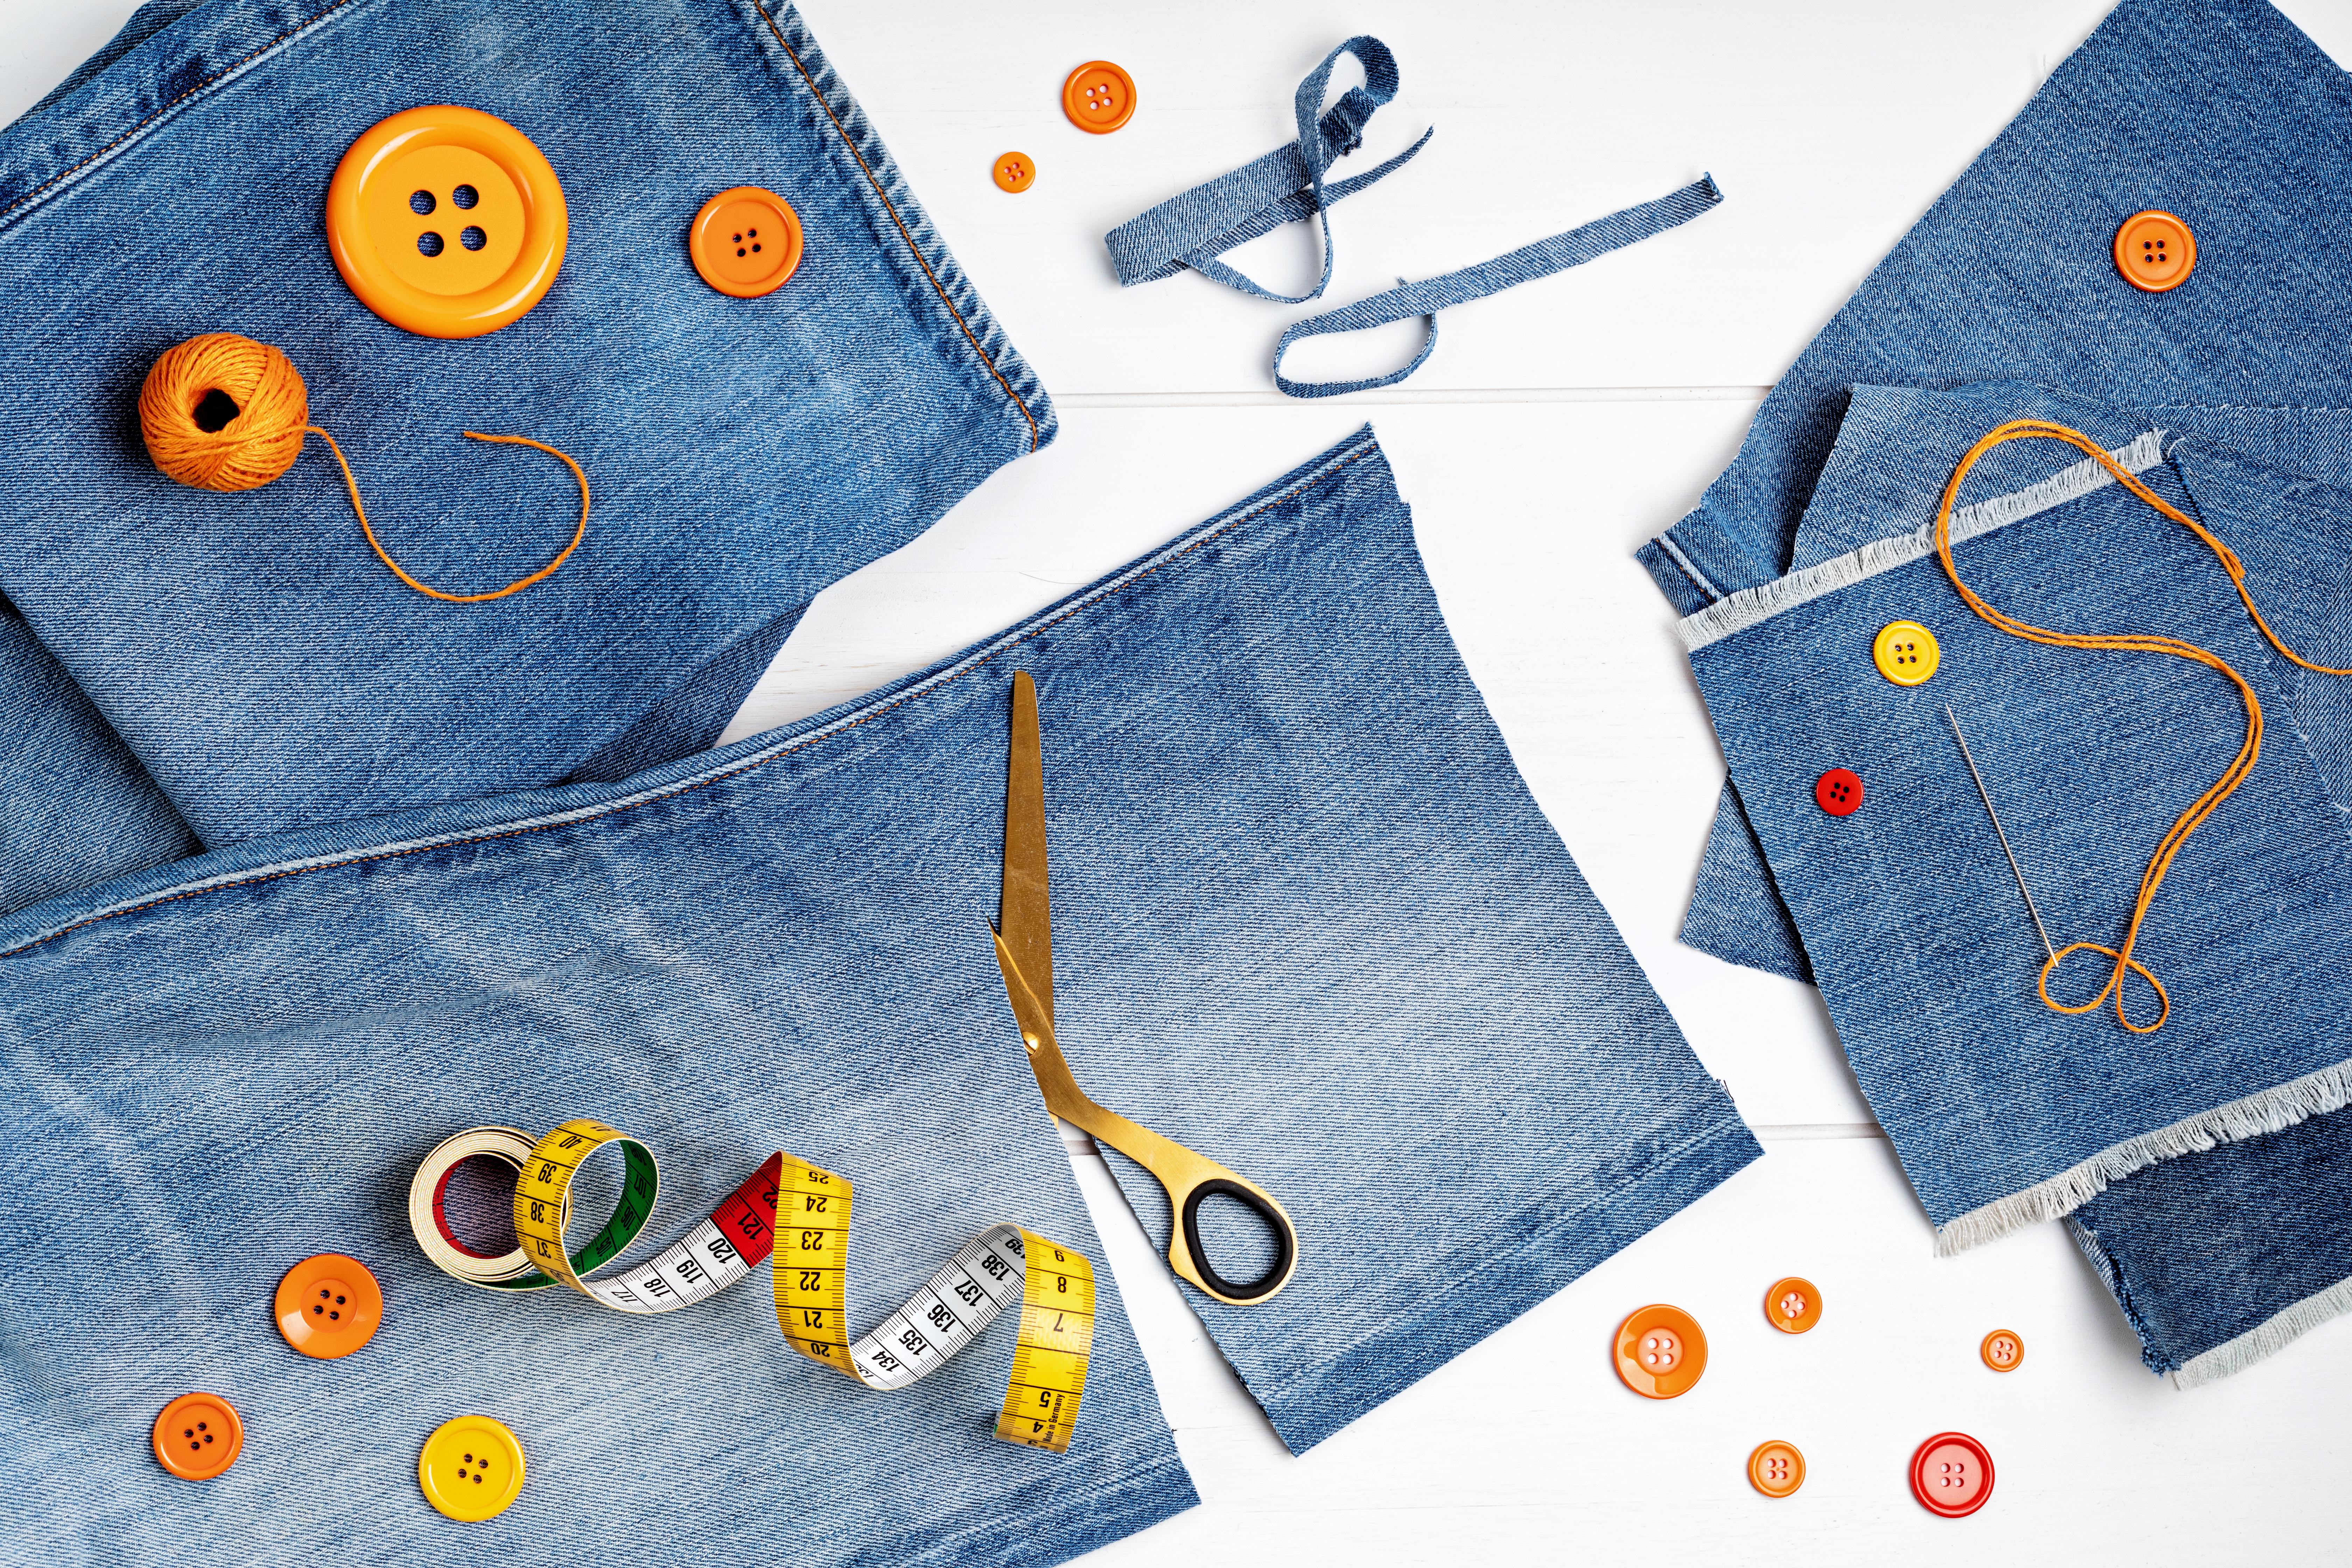 upcycling moda sostenibile